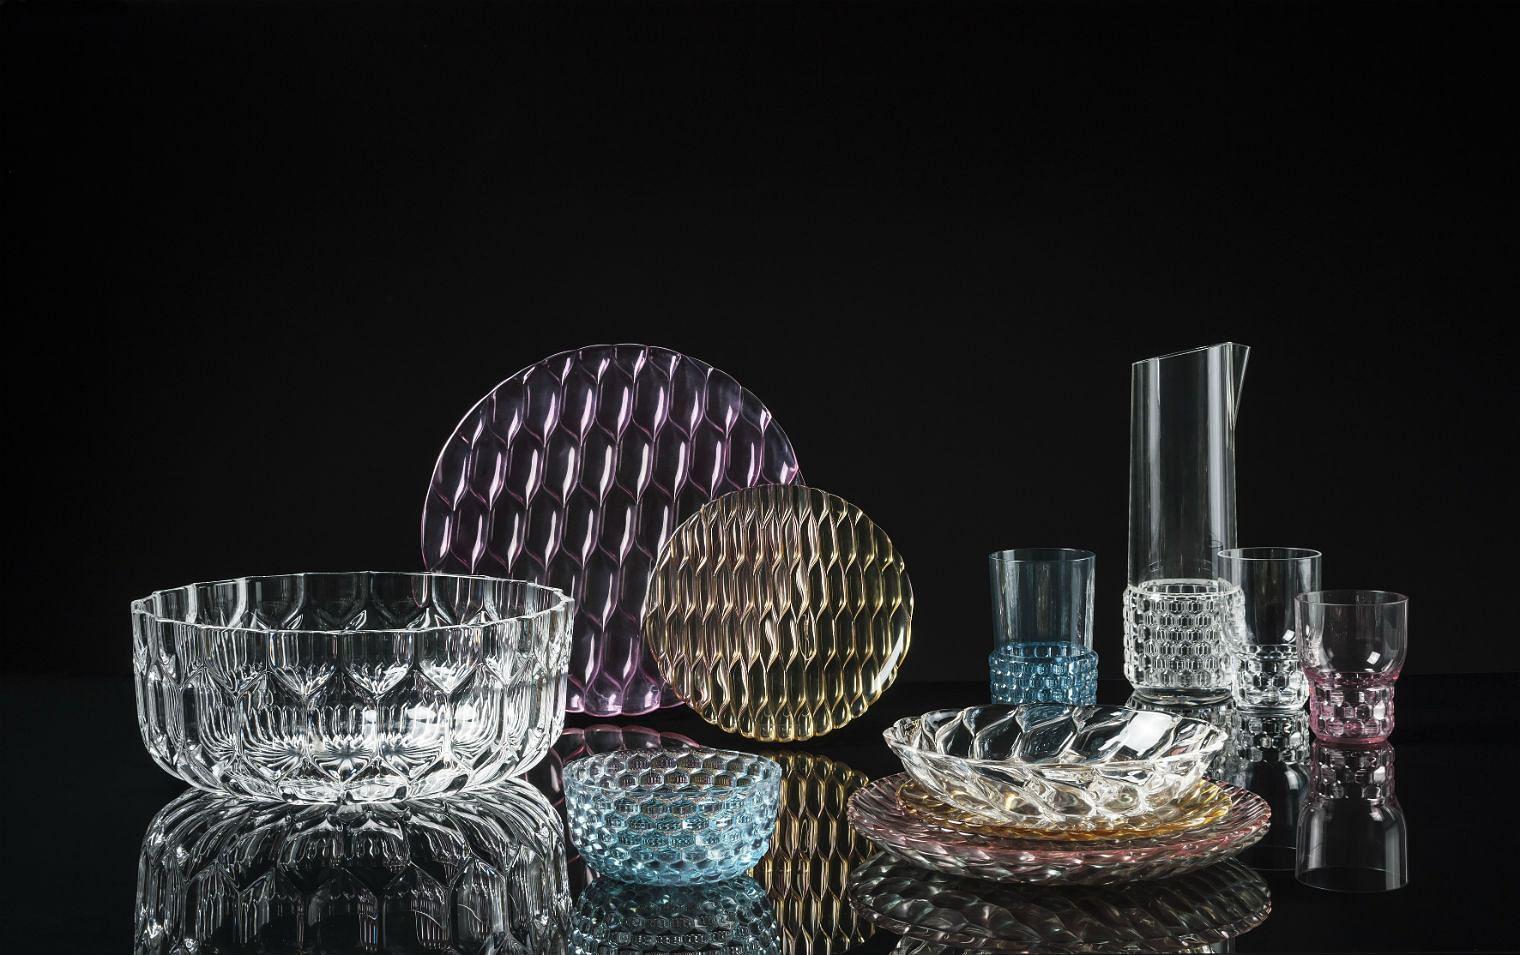 Kartell, tableware, acrylic tableware, plates, bowls